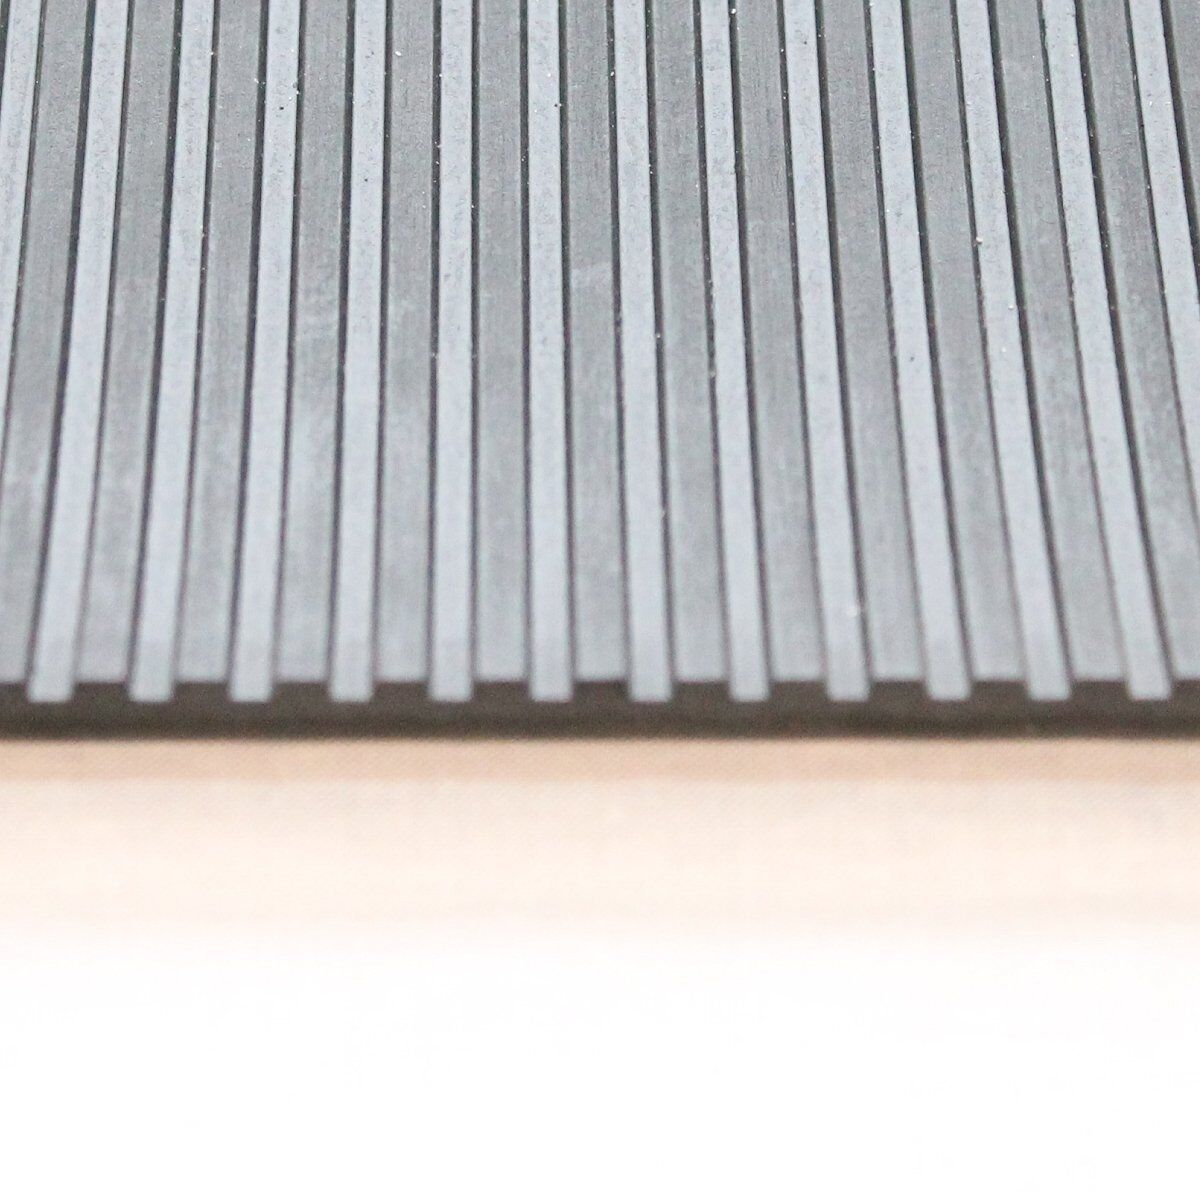 Breitriefenmatte 3mm 1200x5000mm Nero Tappetino in Gomma Profilmatte